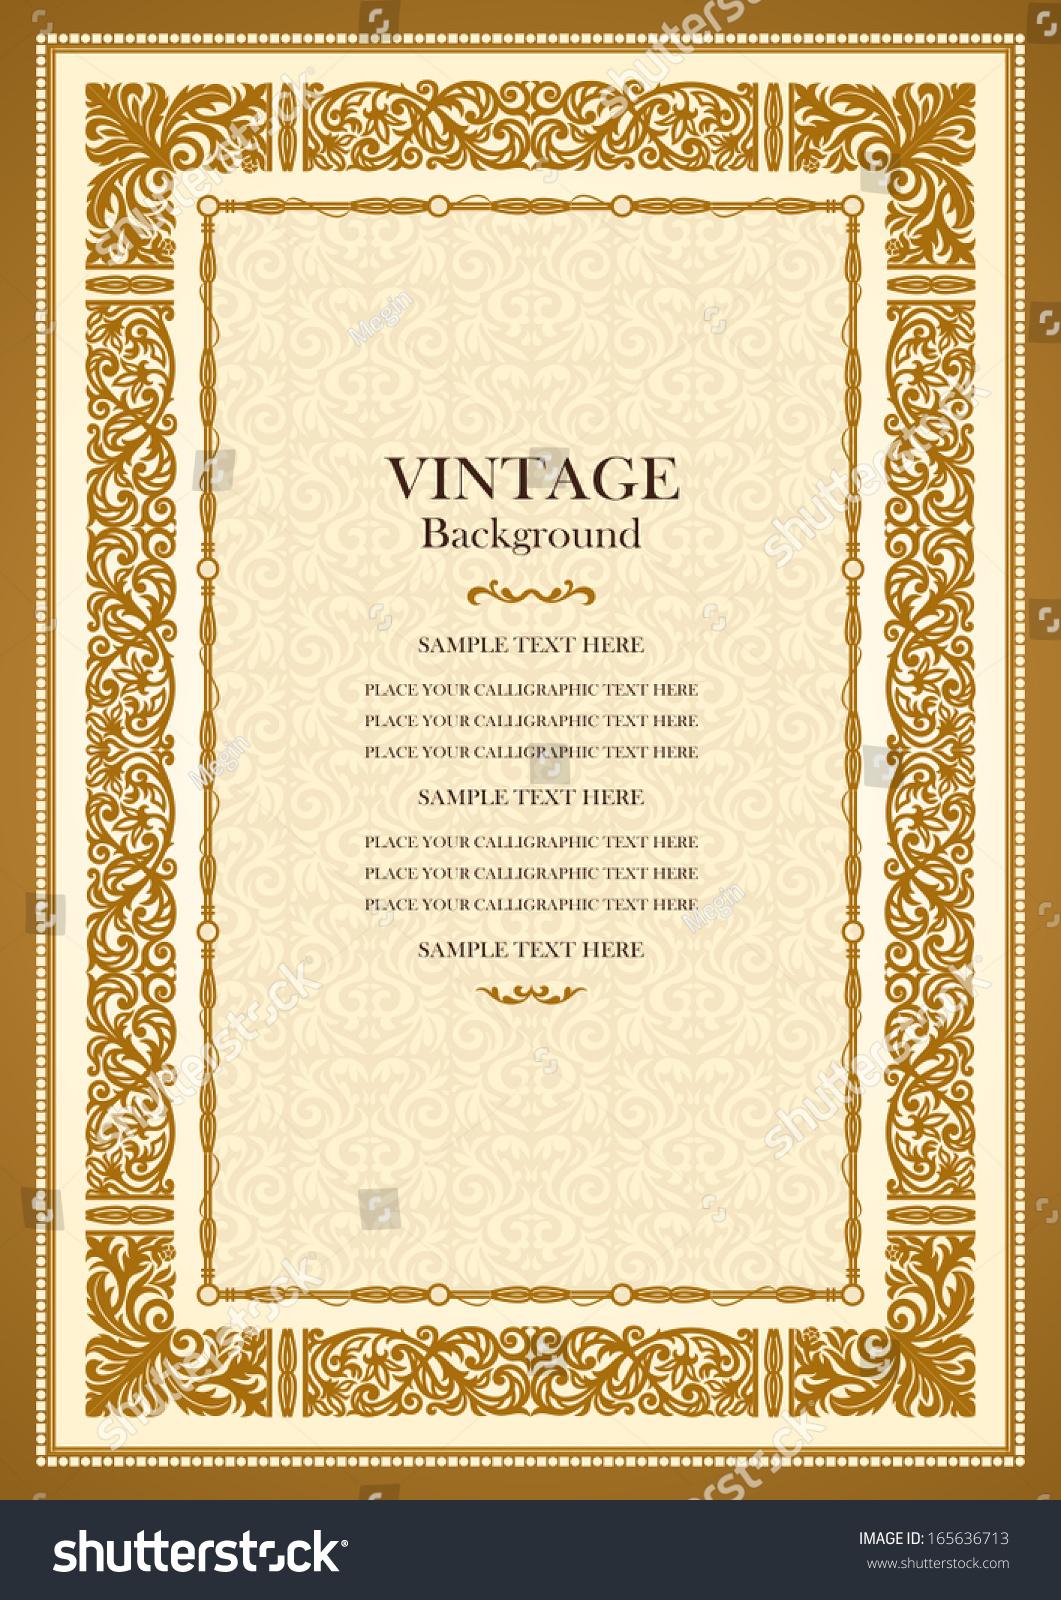 vintage gold background antique style frame stock vector